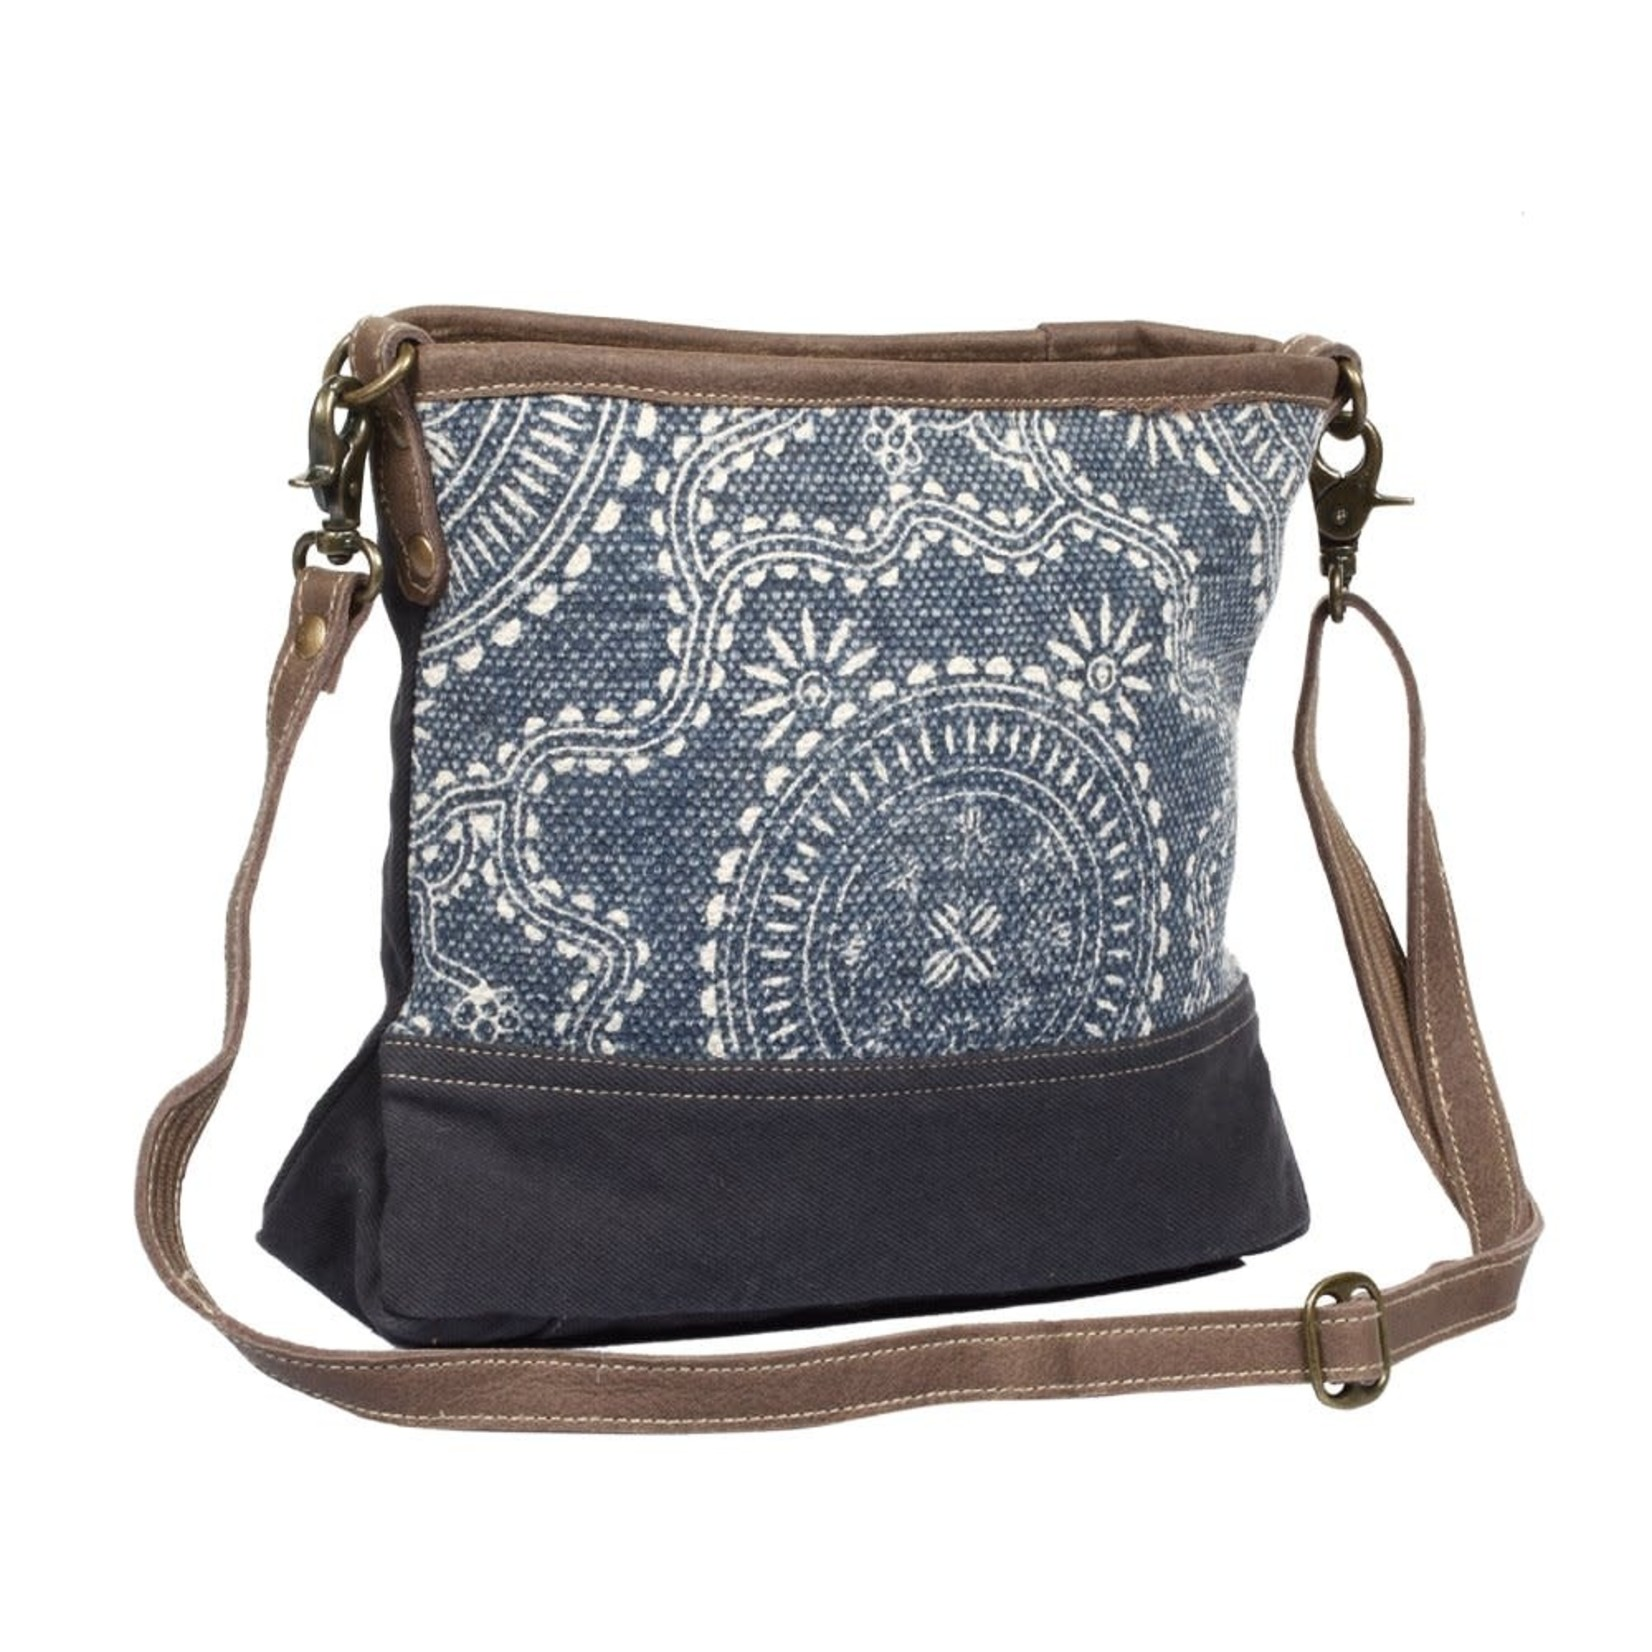 Myra Bags S-1320 Navy Kilim Shoulder Bag